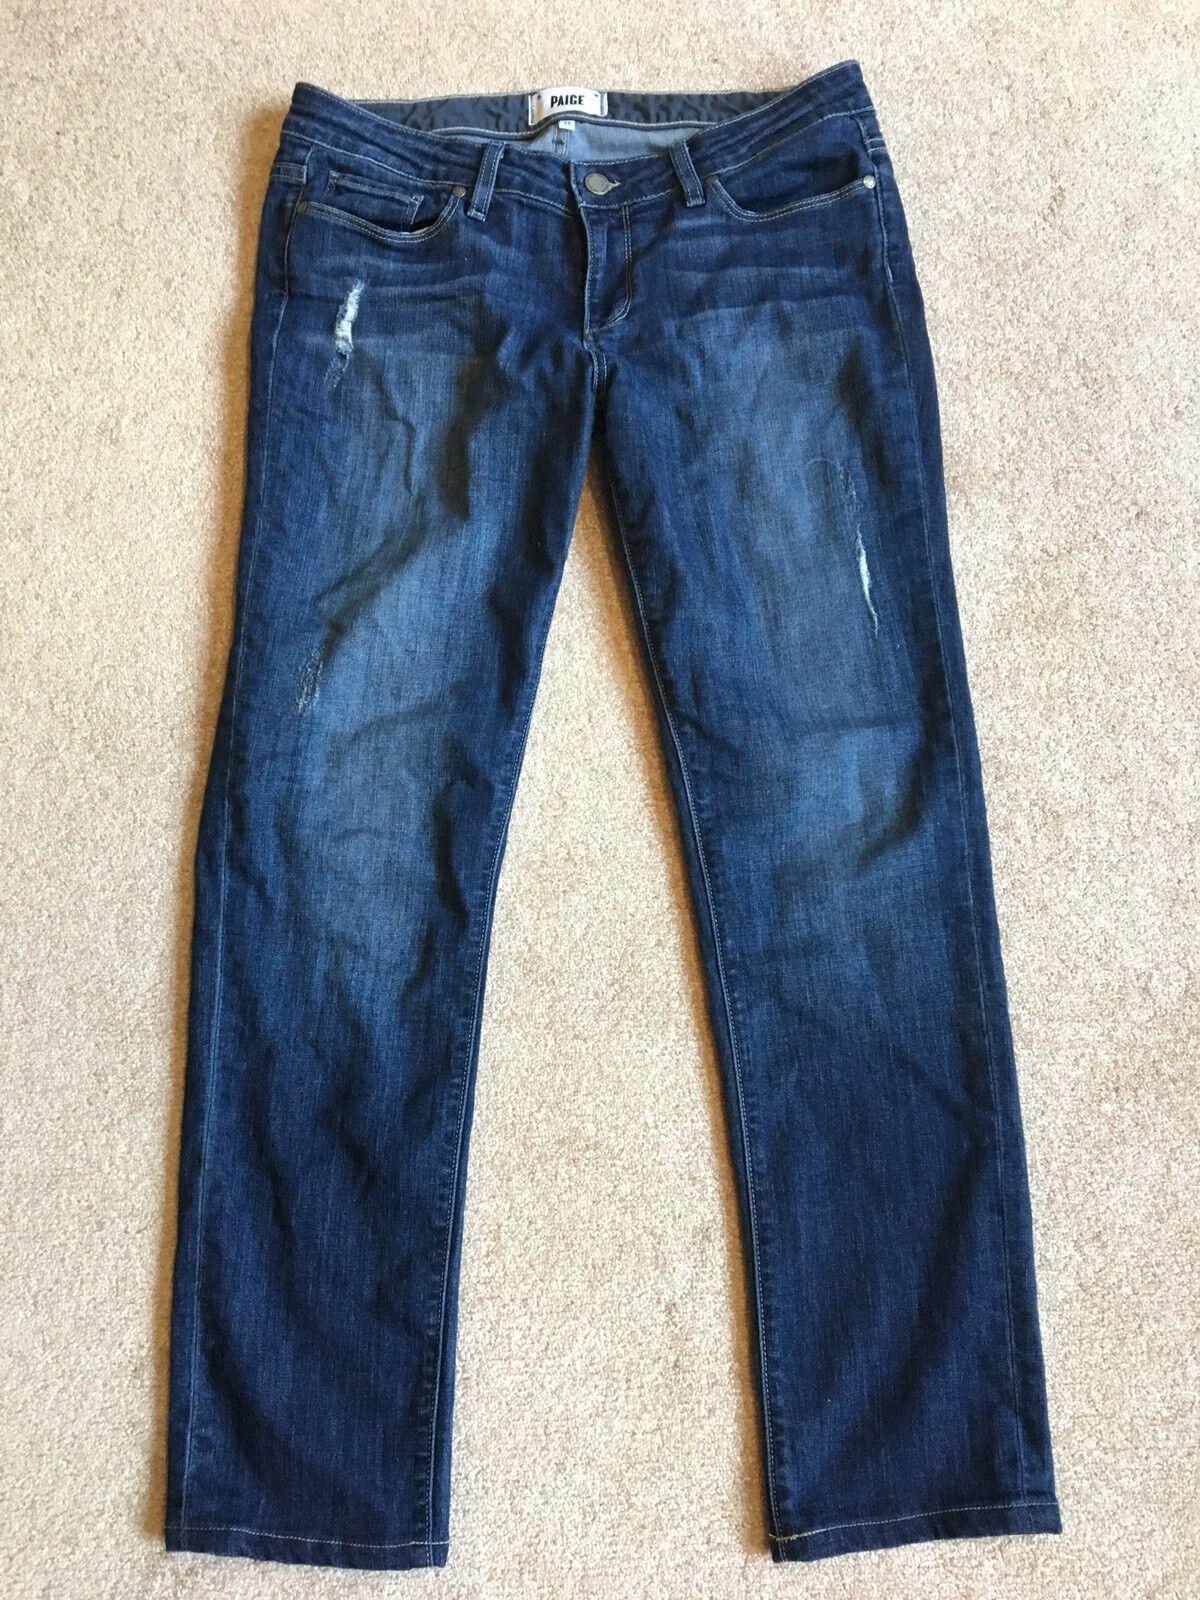 Paige Jimmy Jimmy Skinny Jeans Women's Size 28